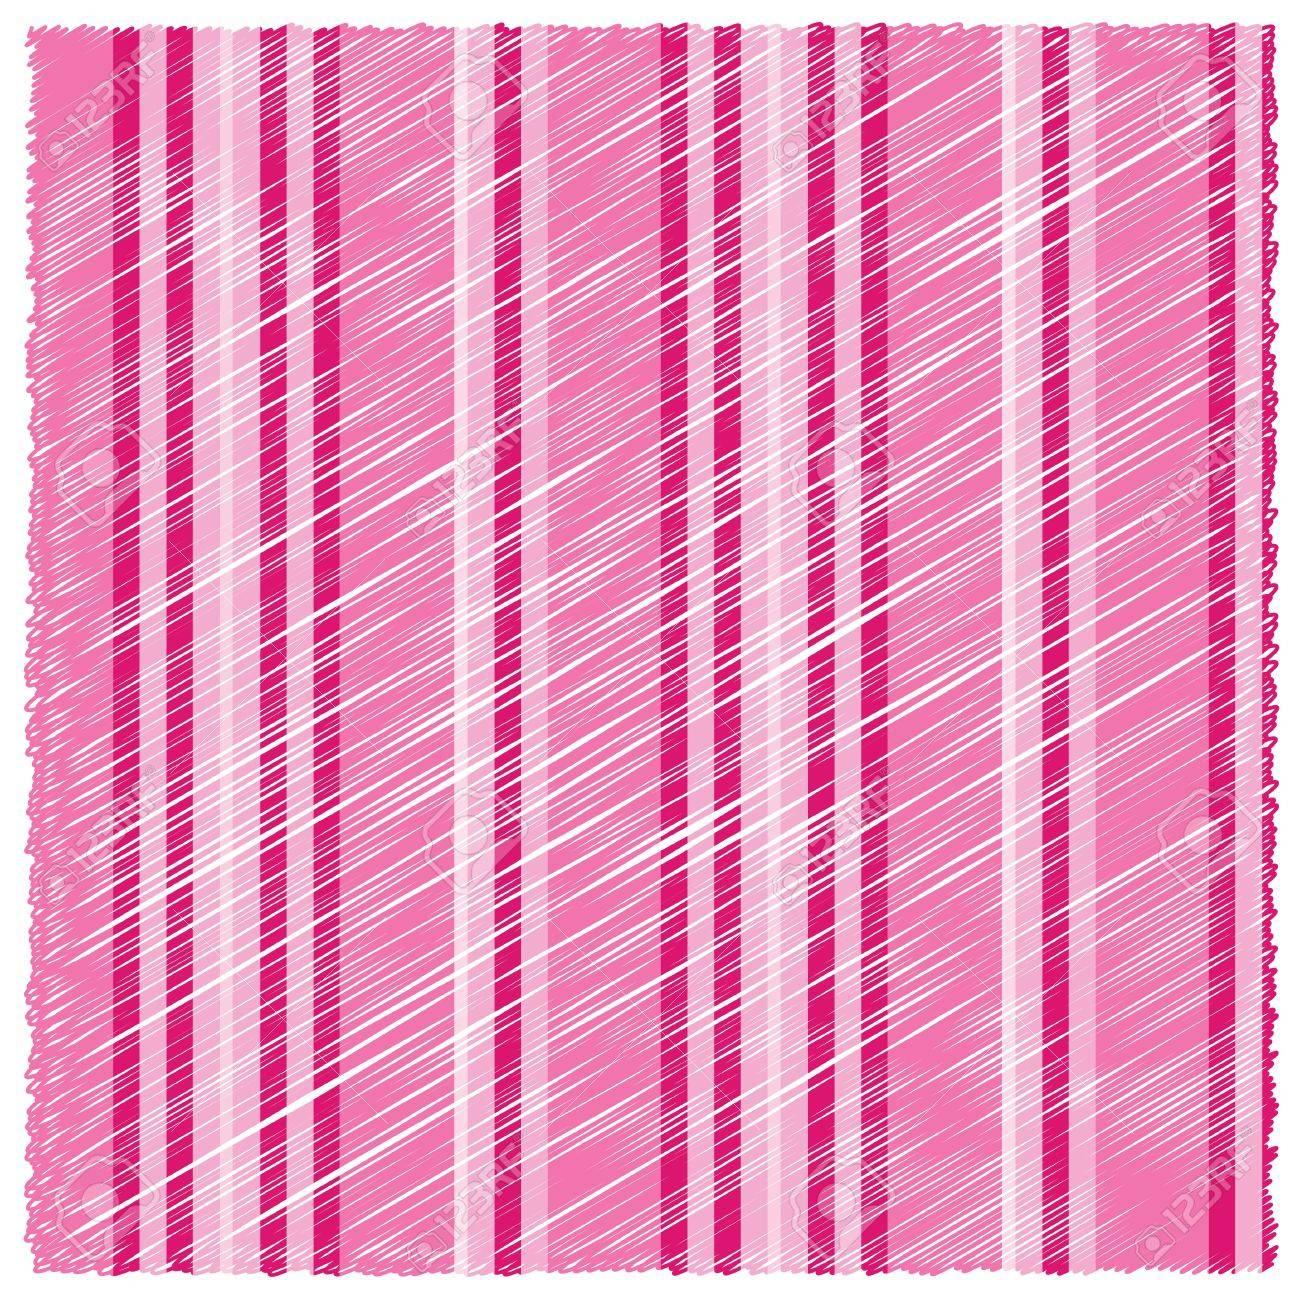 Fondo rosa rayas blancas